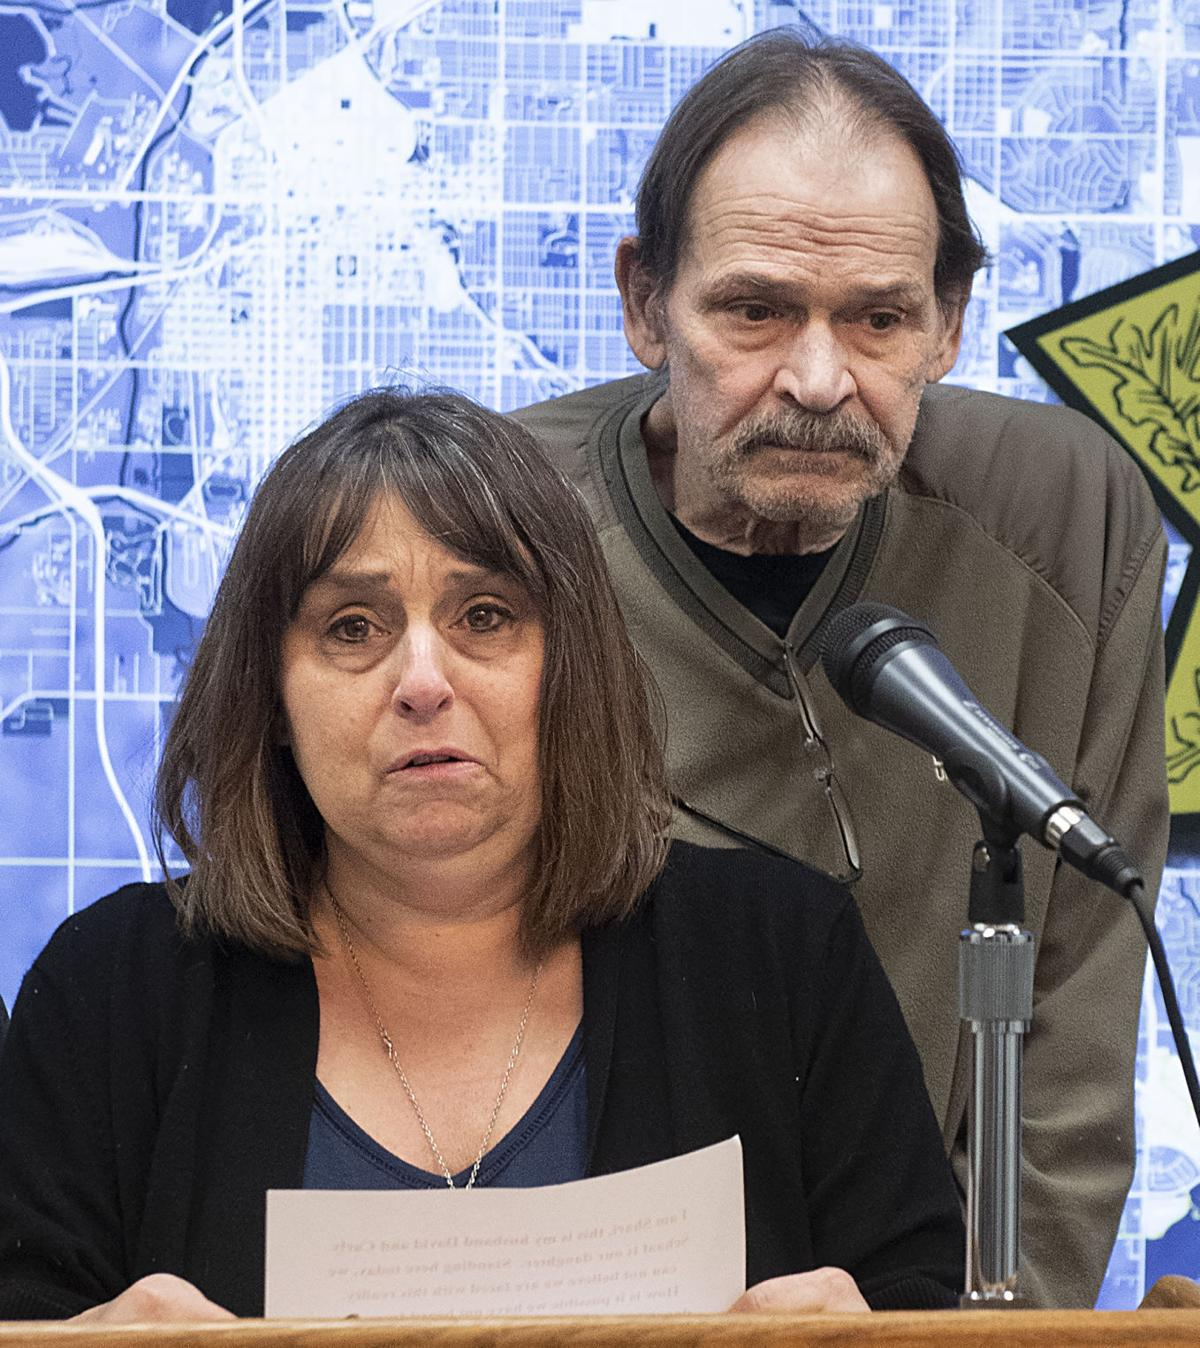 Carly Schaaf parents